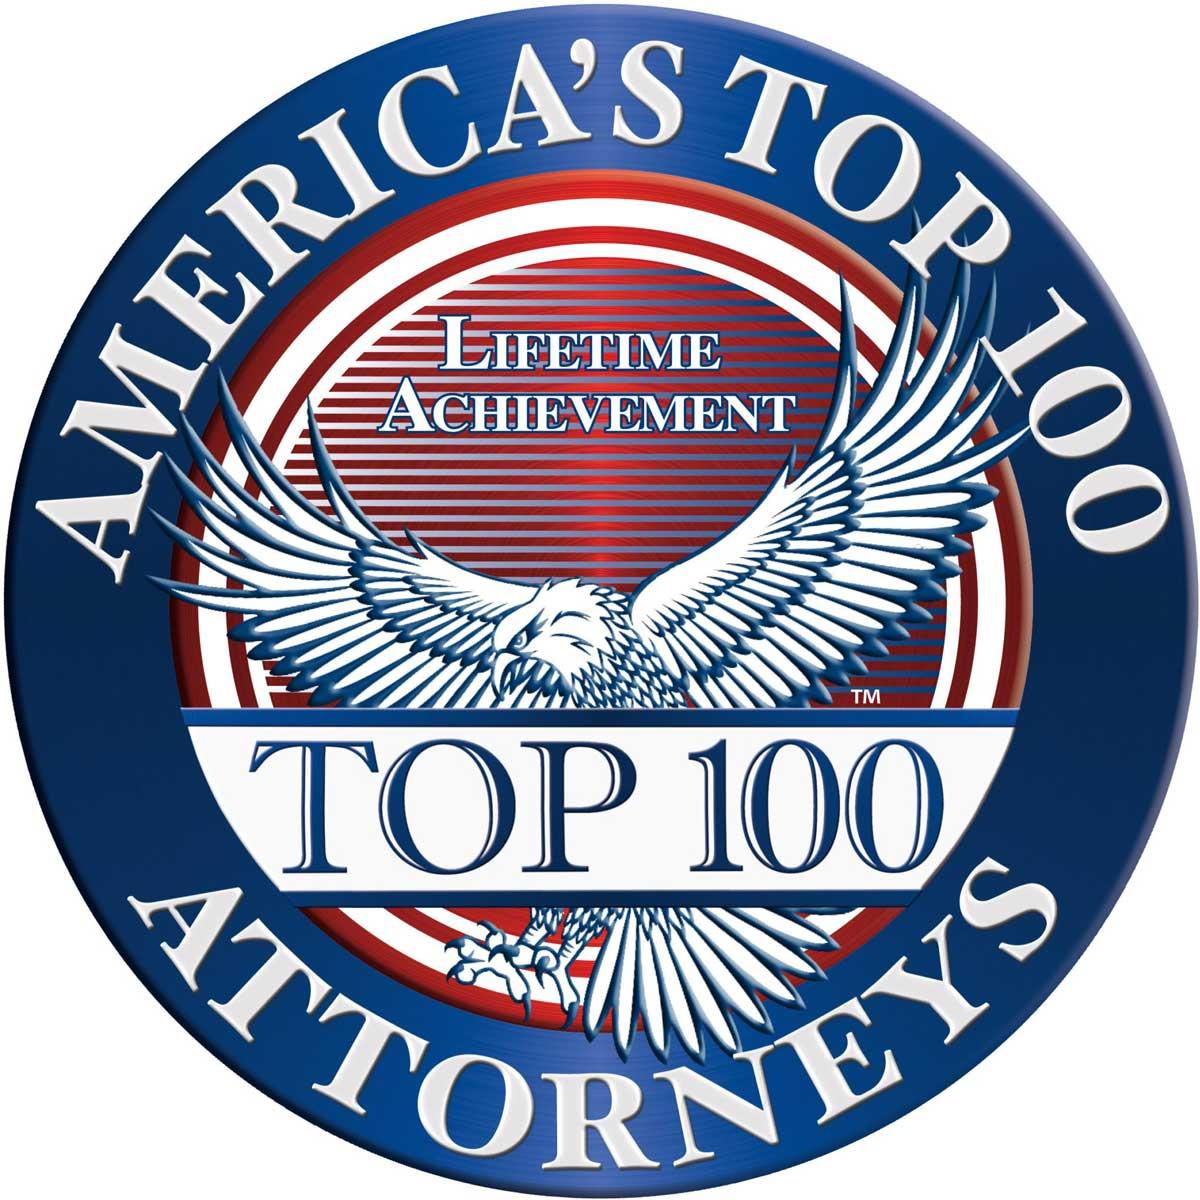 Best Attorney in America